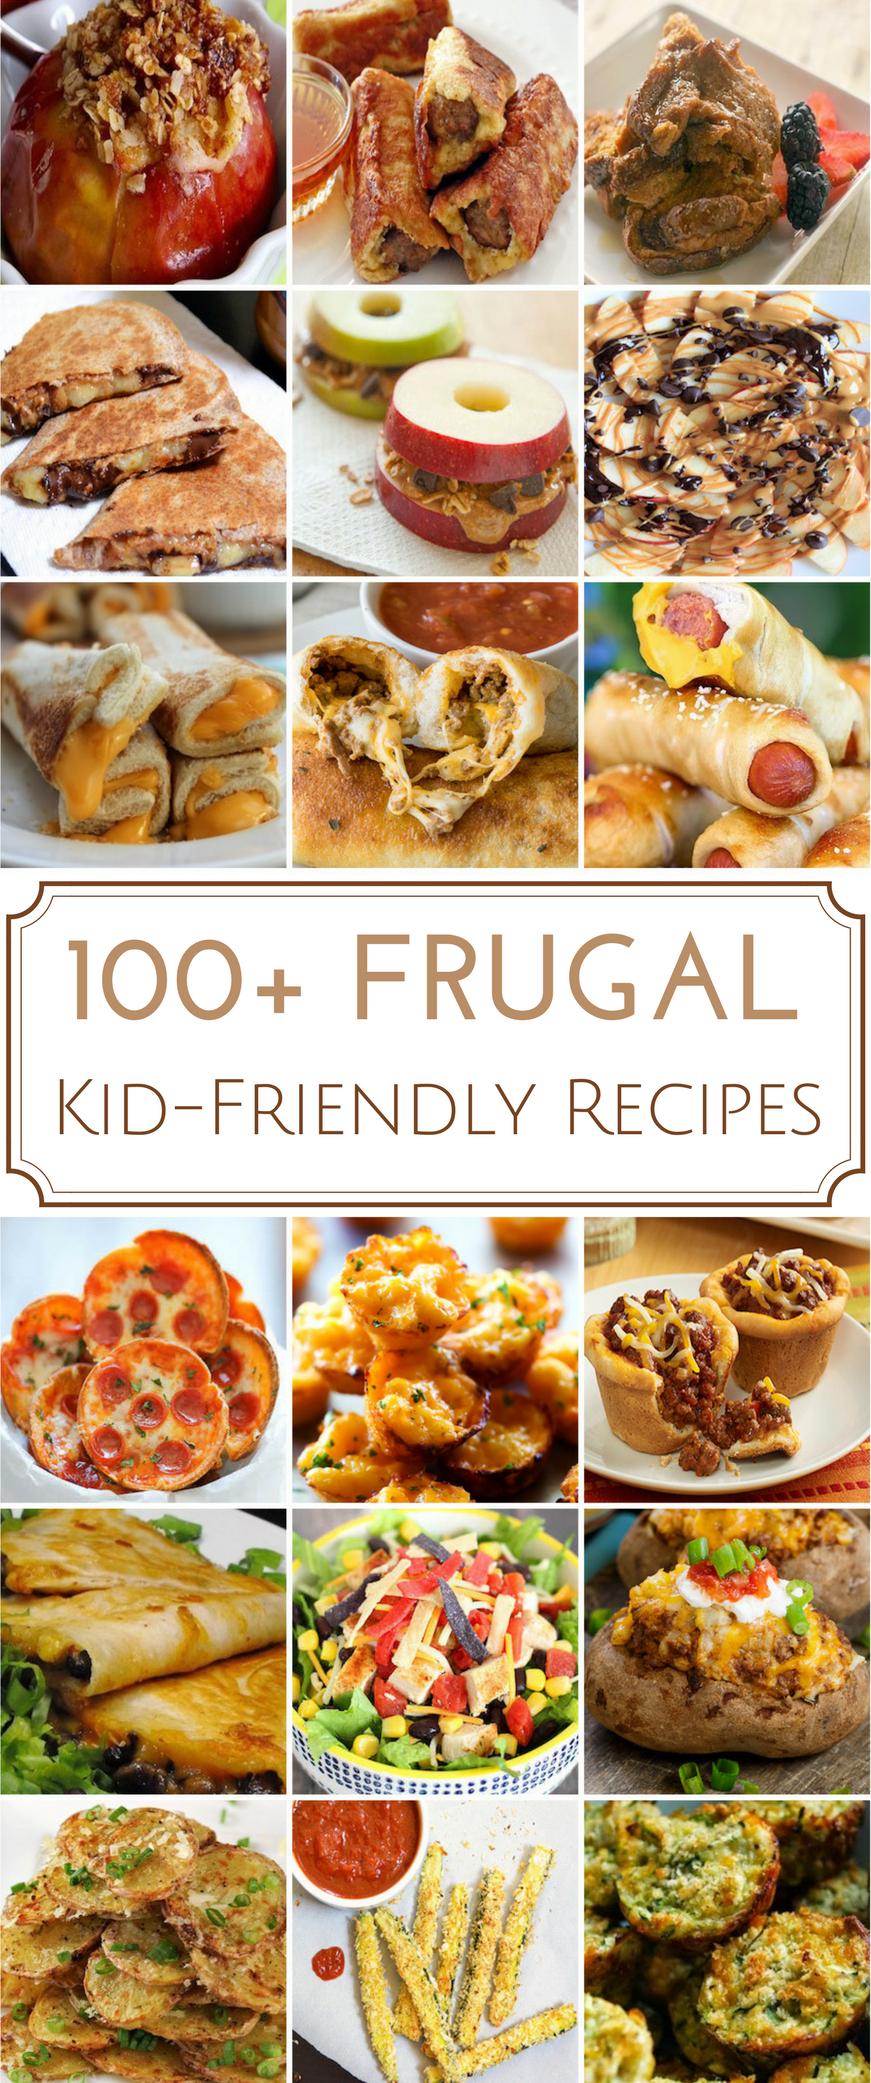 120 Frugal Kid Friendly Recipes Kid Friendly Meals Kid Friendly Recipes Breakfast Frugal Meals